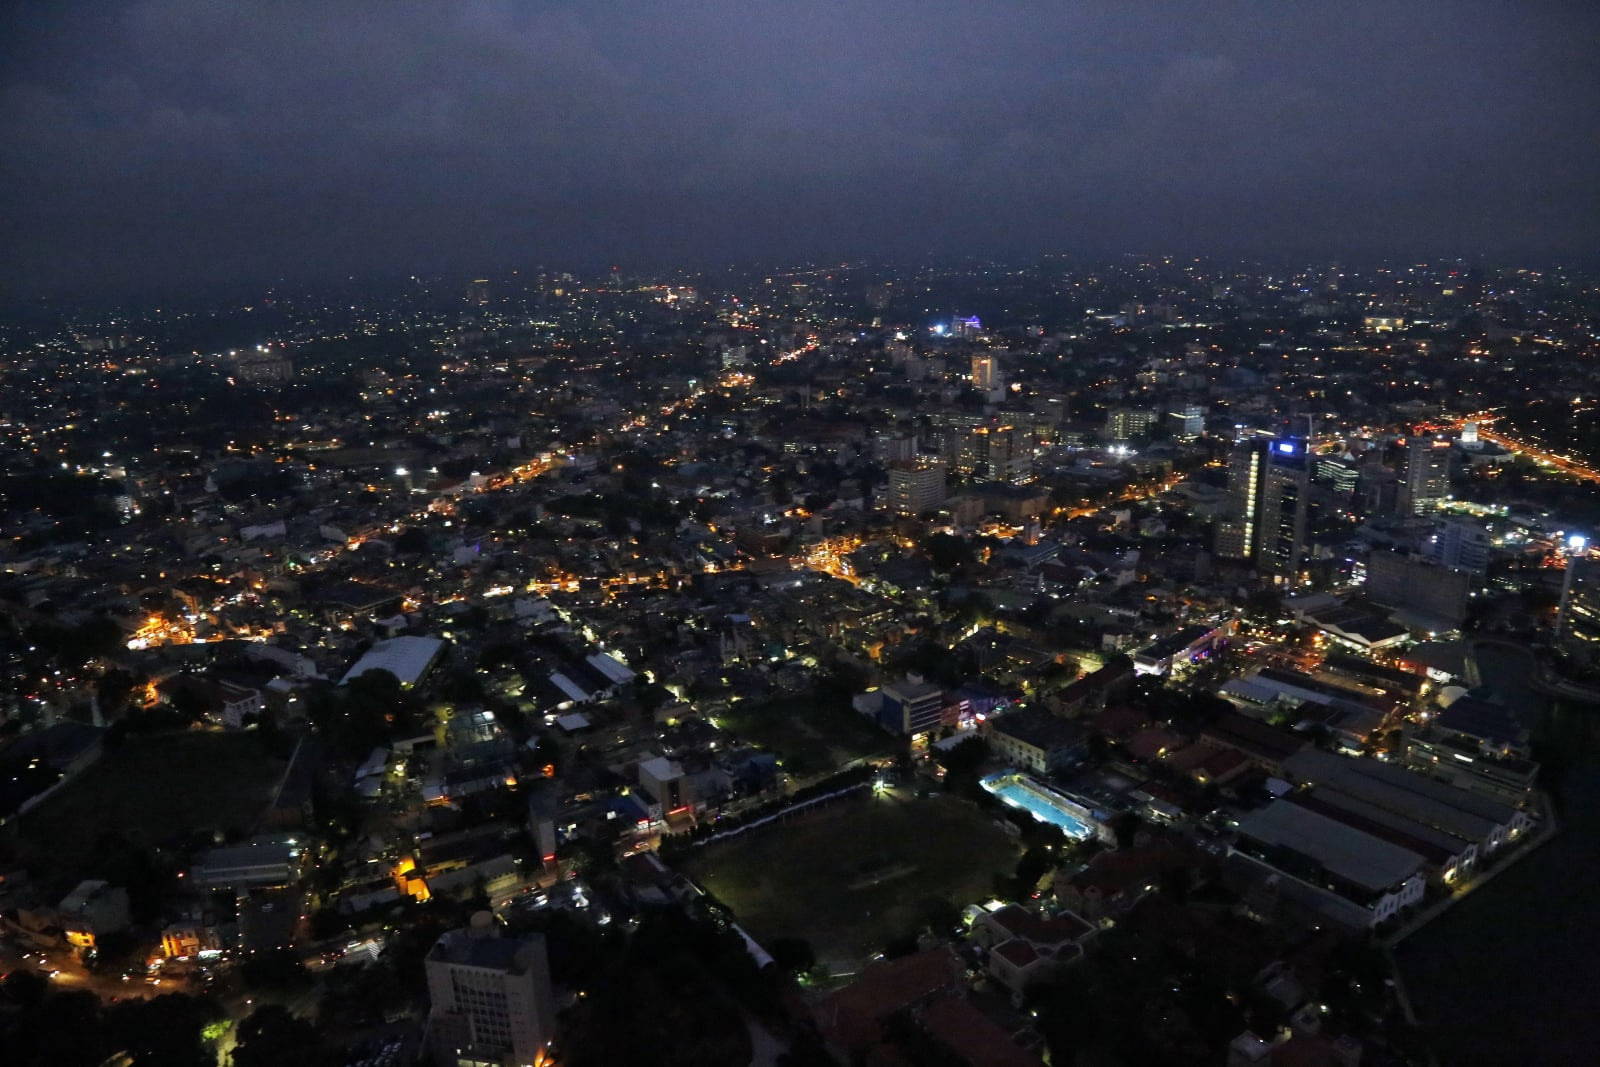 Miasto Colombo (Sri Lanka) nocą fot. EPA/M.A.PUSHPA KUMARA